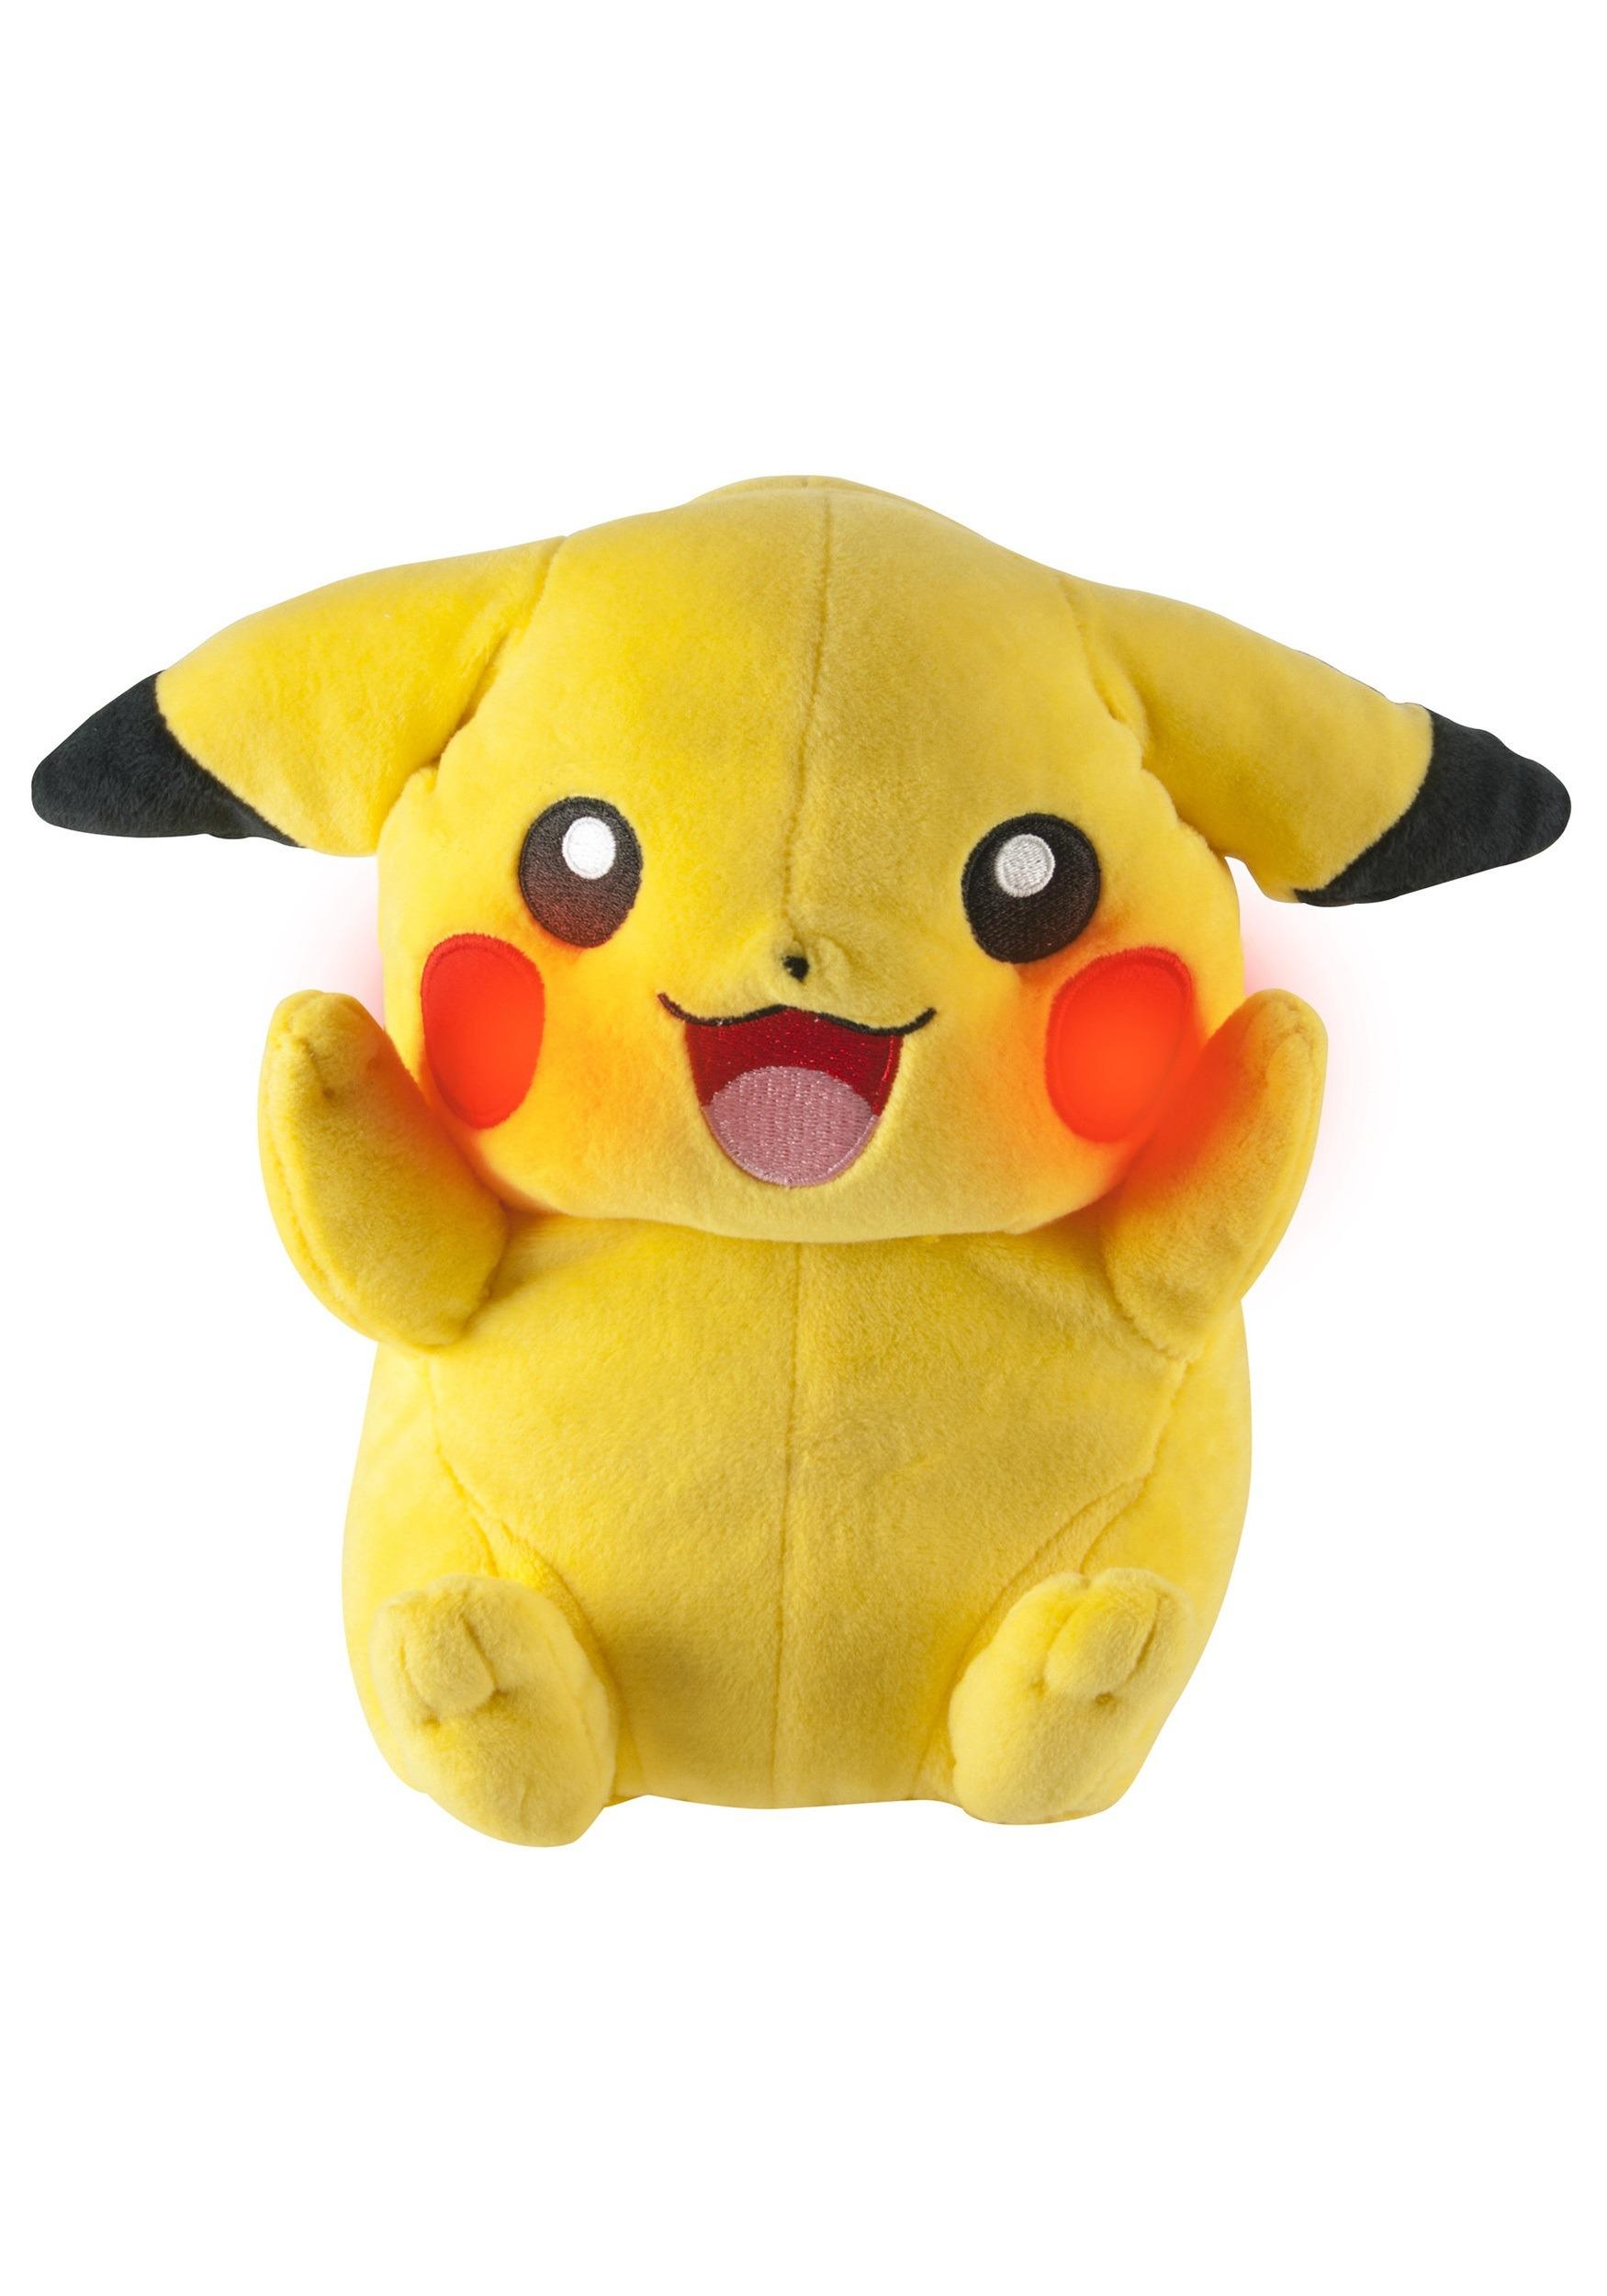 Pikachu Pokemon Talking Plush Toy